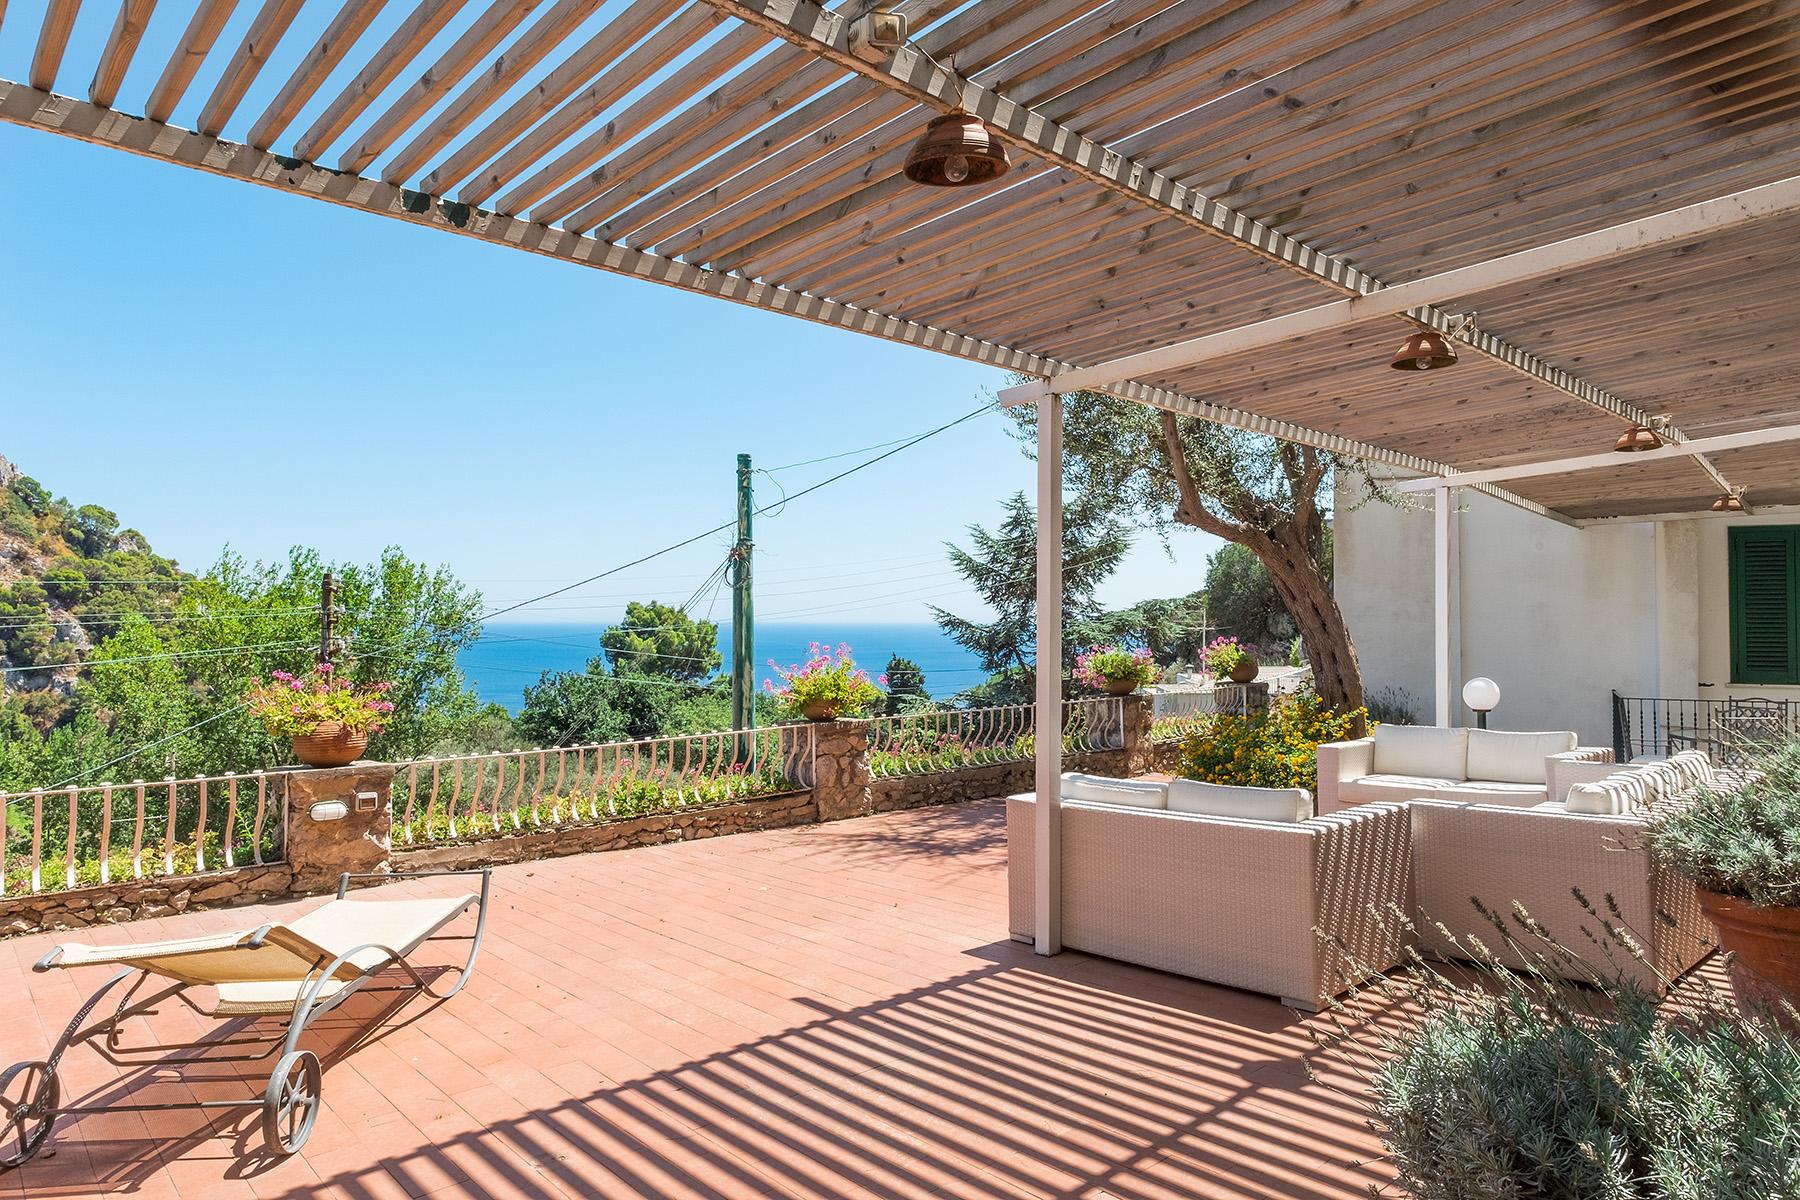 Other Residential for Sale at Panoramic Villa in Capri Capri, Naples, Italy